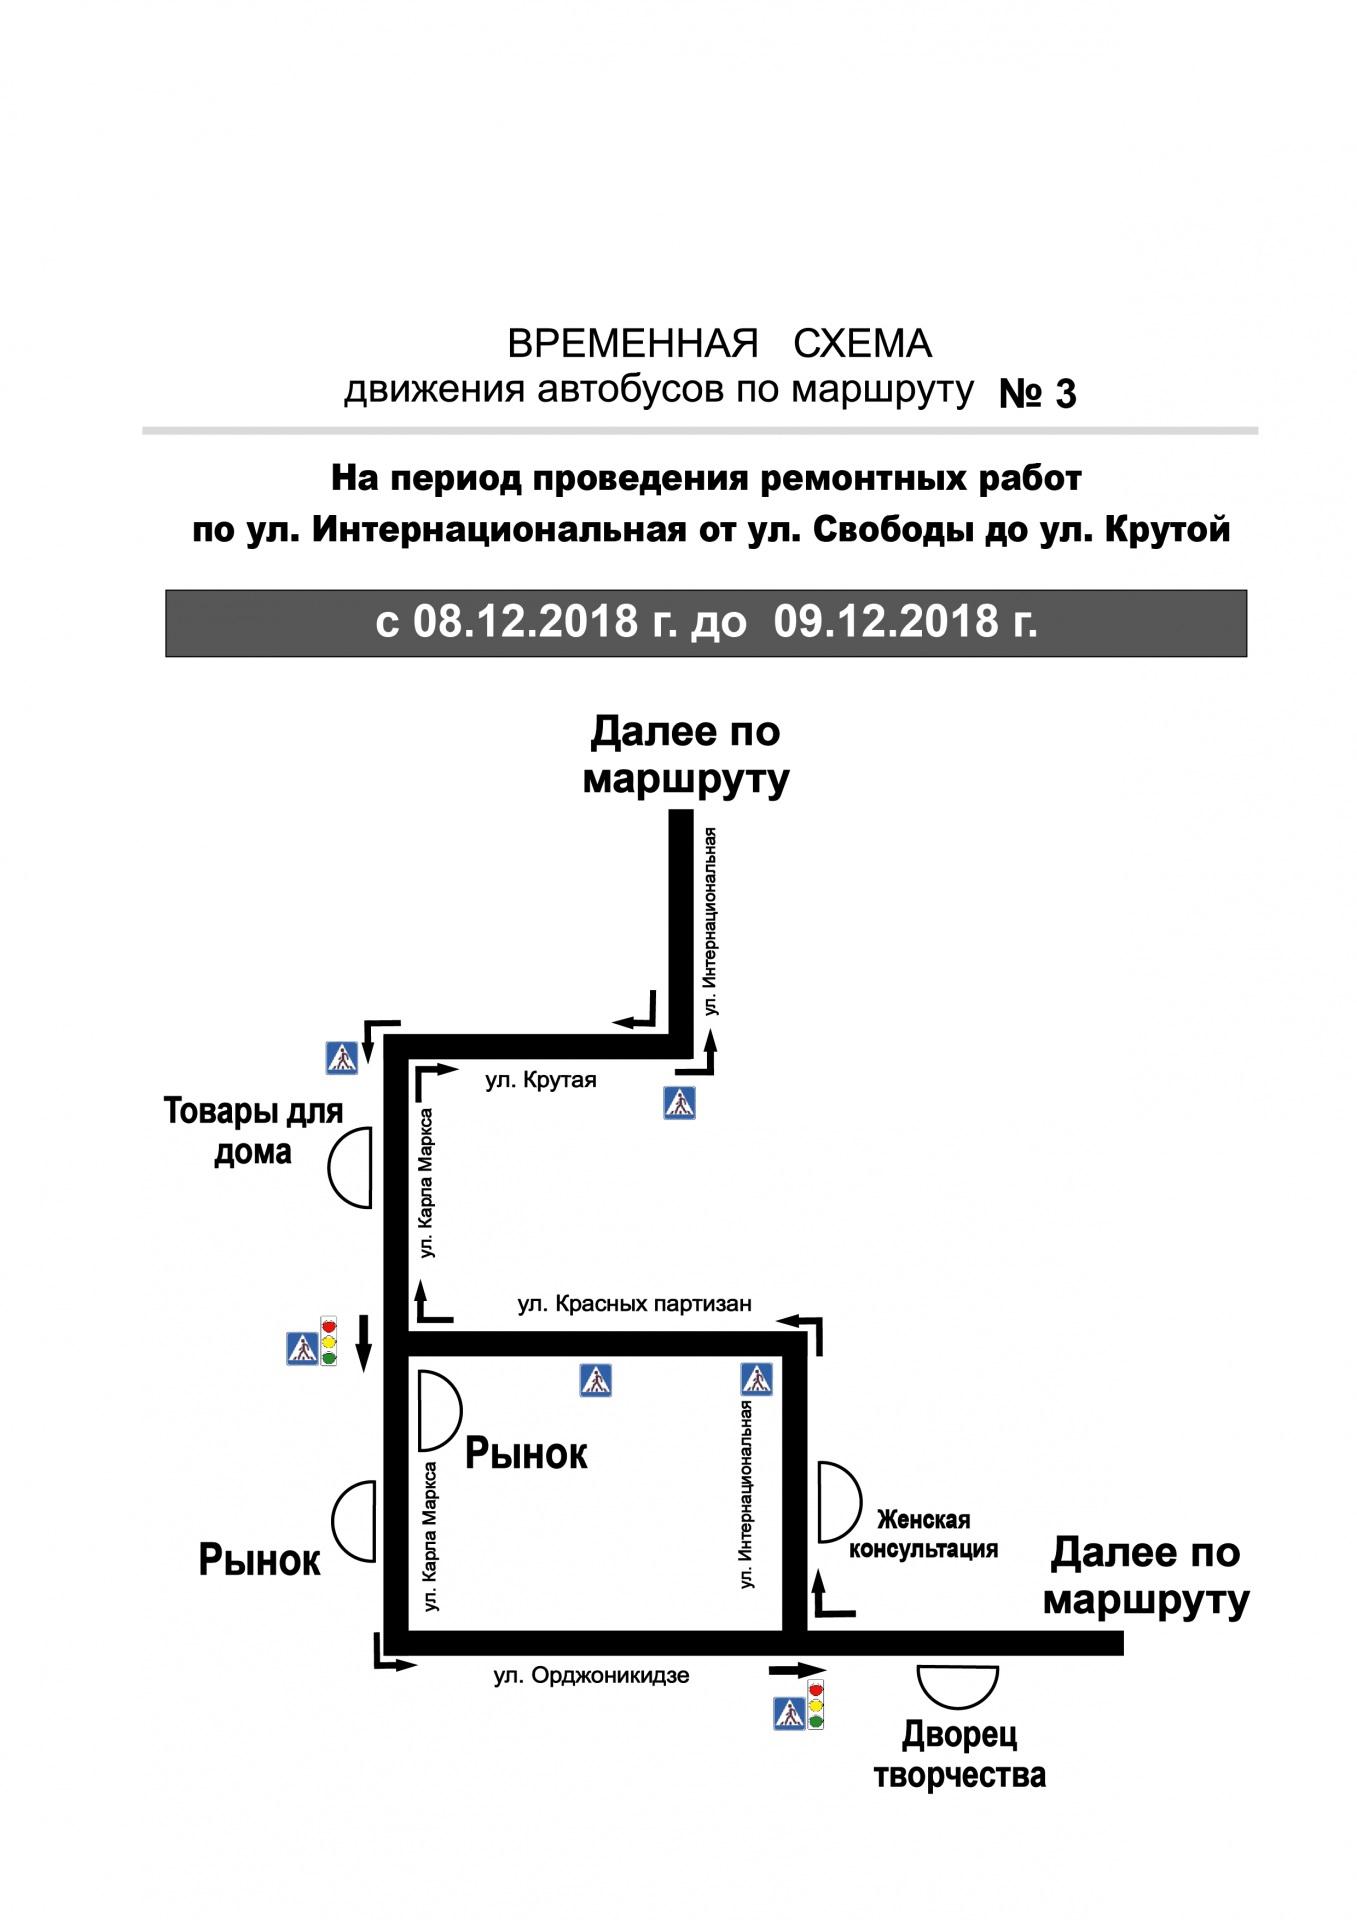 Remon-Internazionalnaya_18-01.jpg